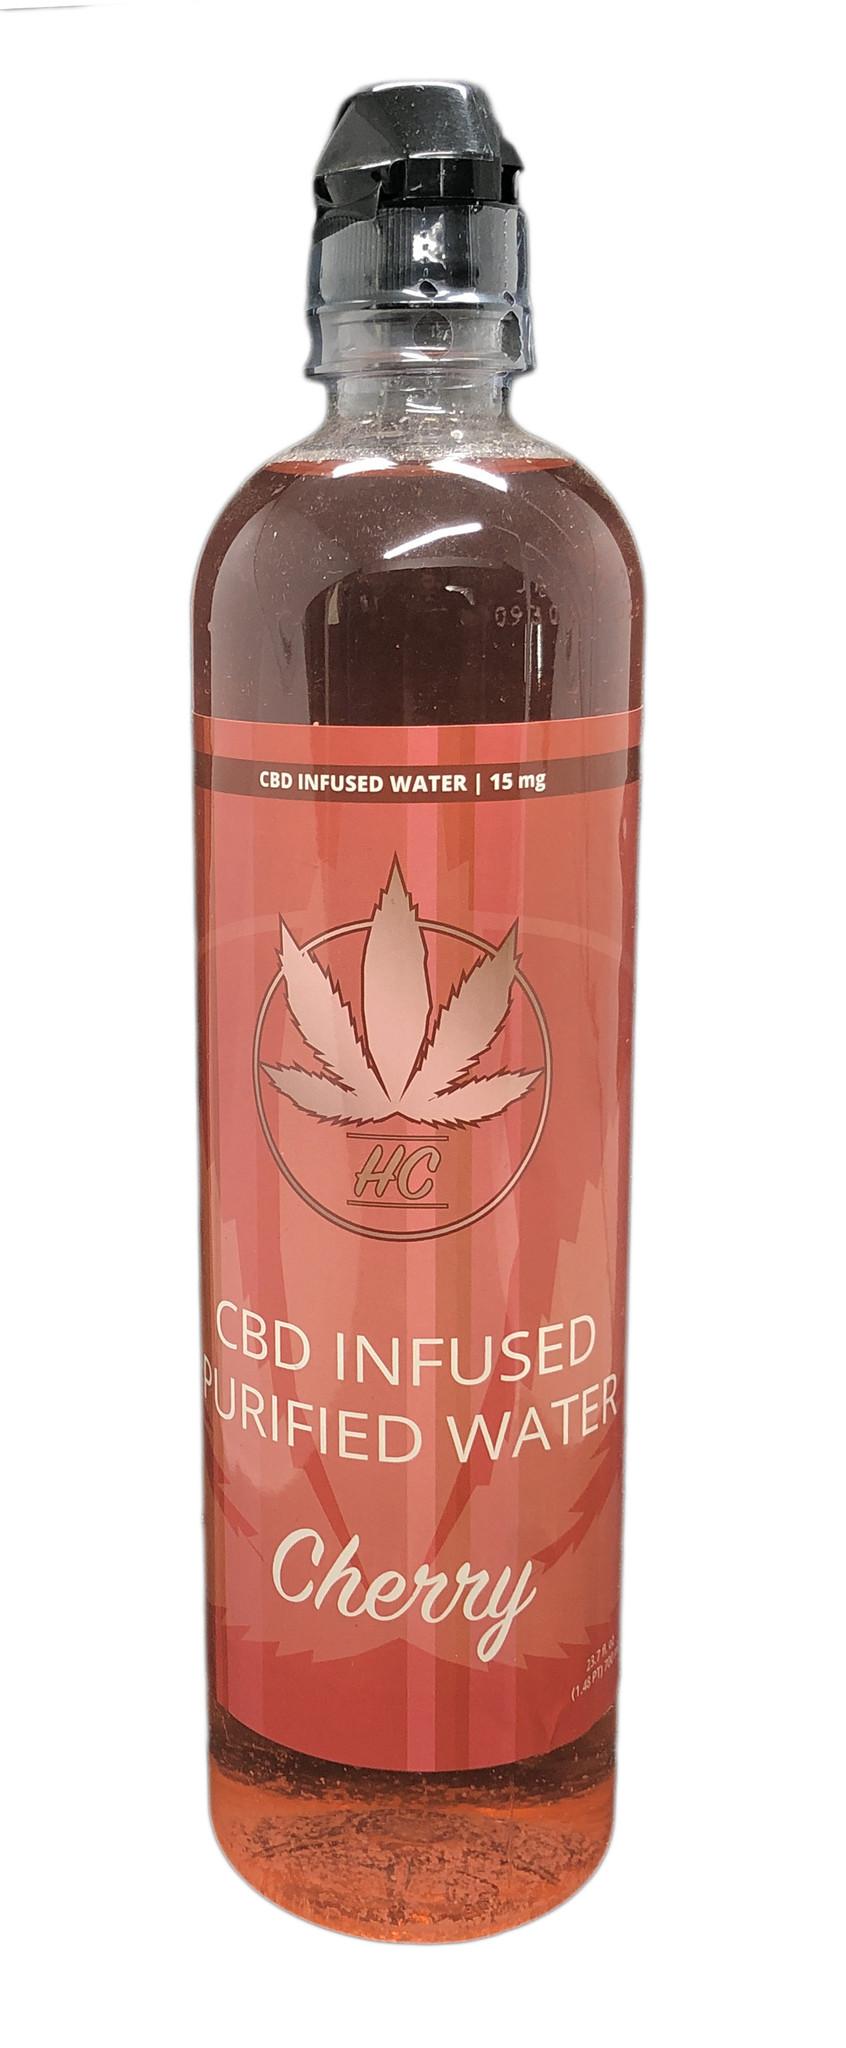 Heavenly Candy CBD PURIFIED WATER | CHERRY | 15mg | 23.7 Fl Oz